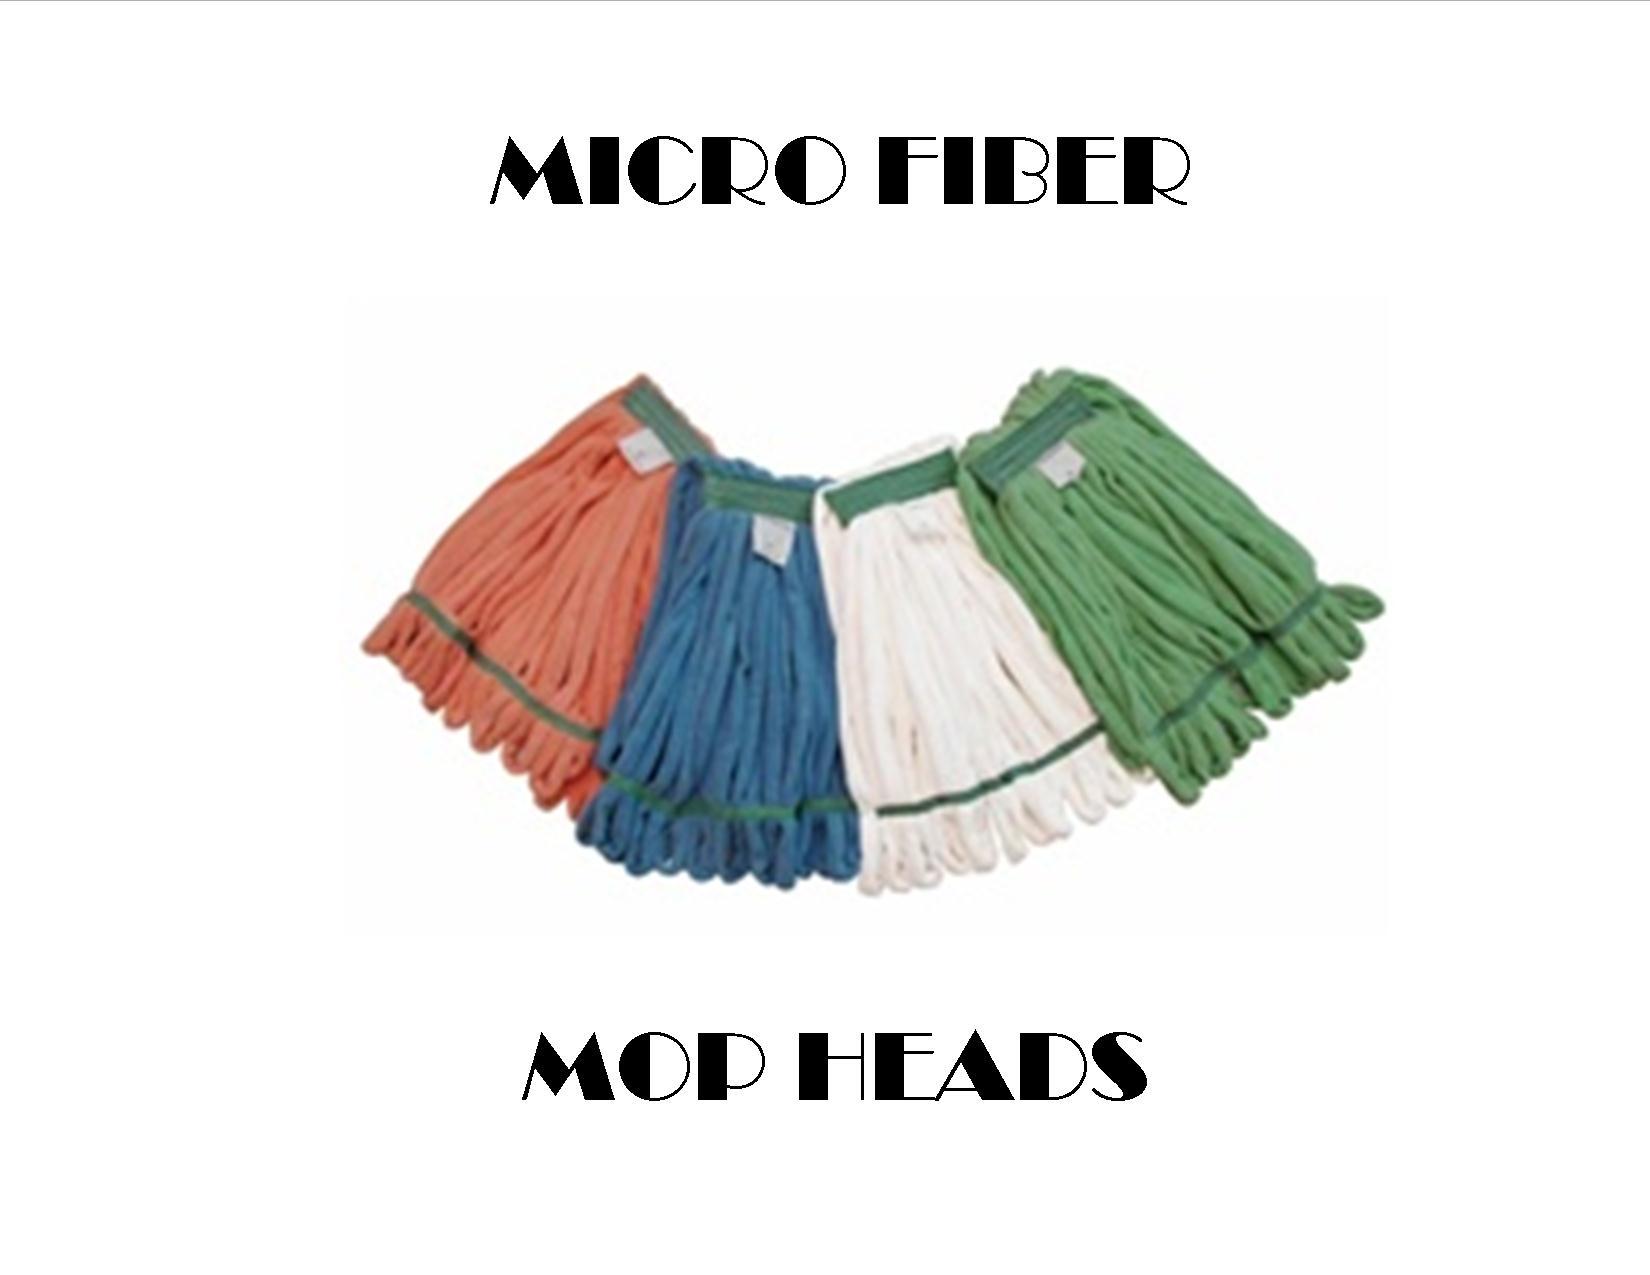 Microfiber Mop Heads Microfiber Mop Heads 4